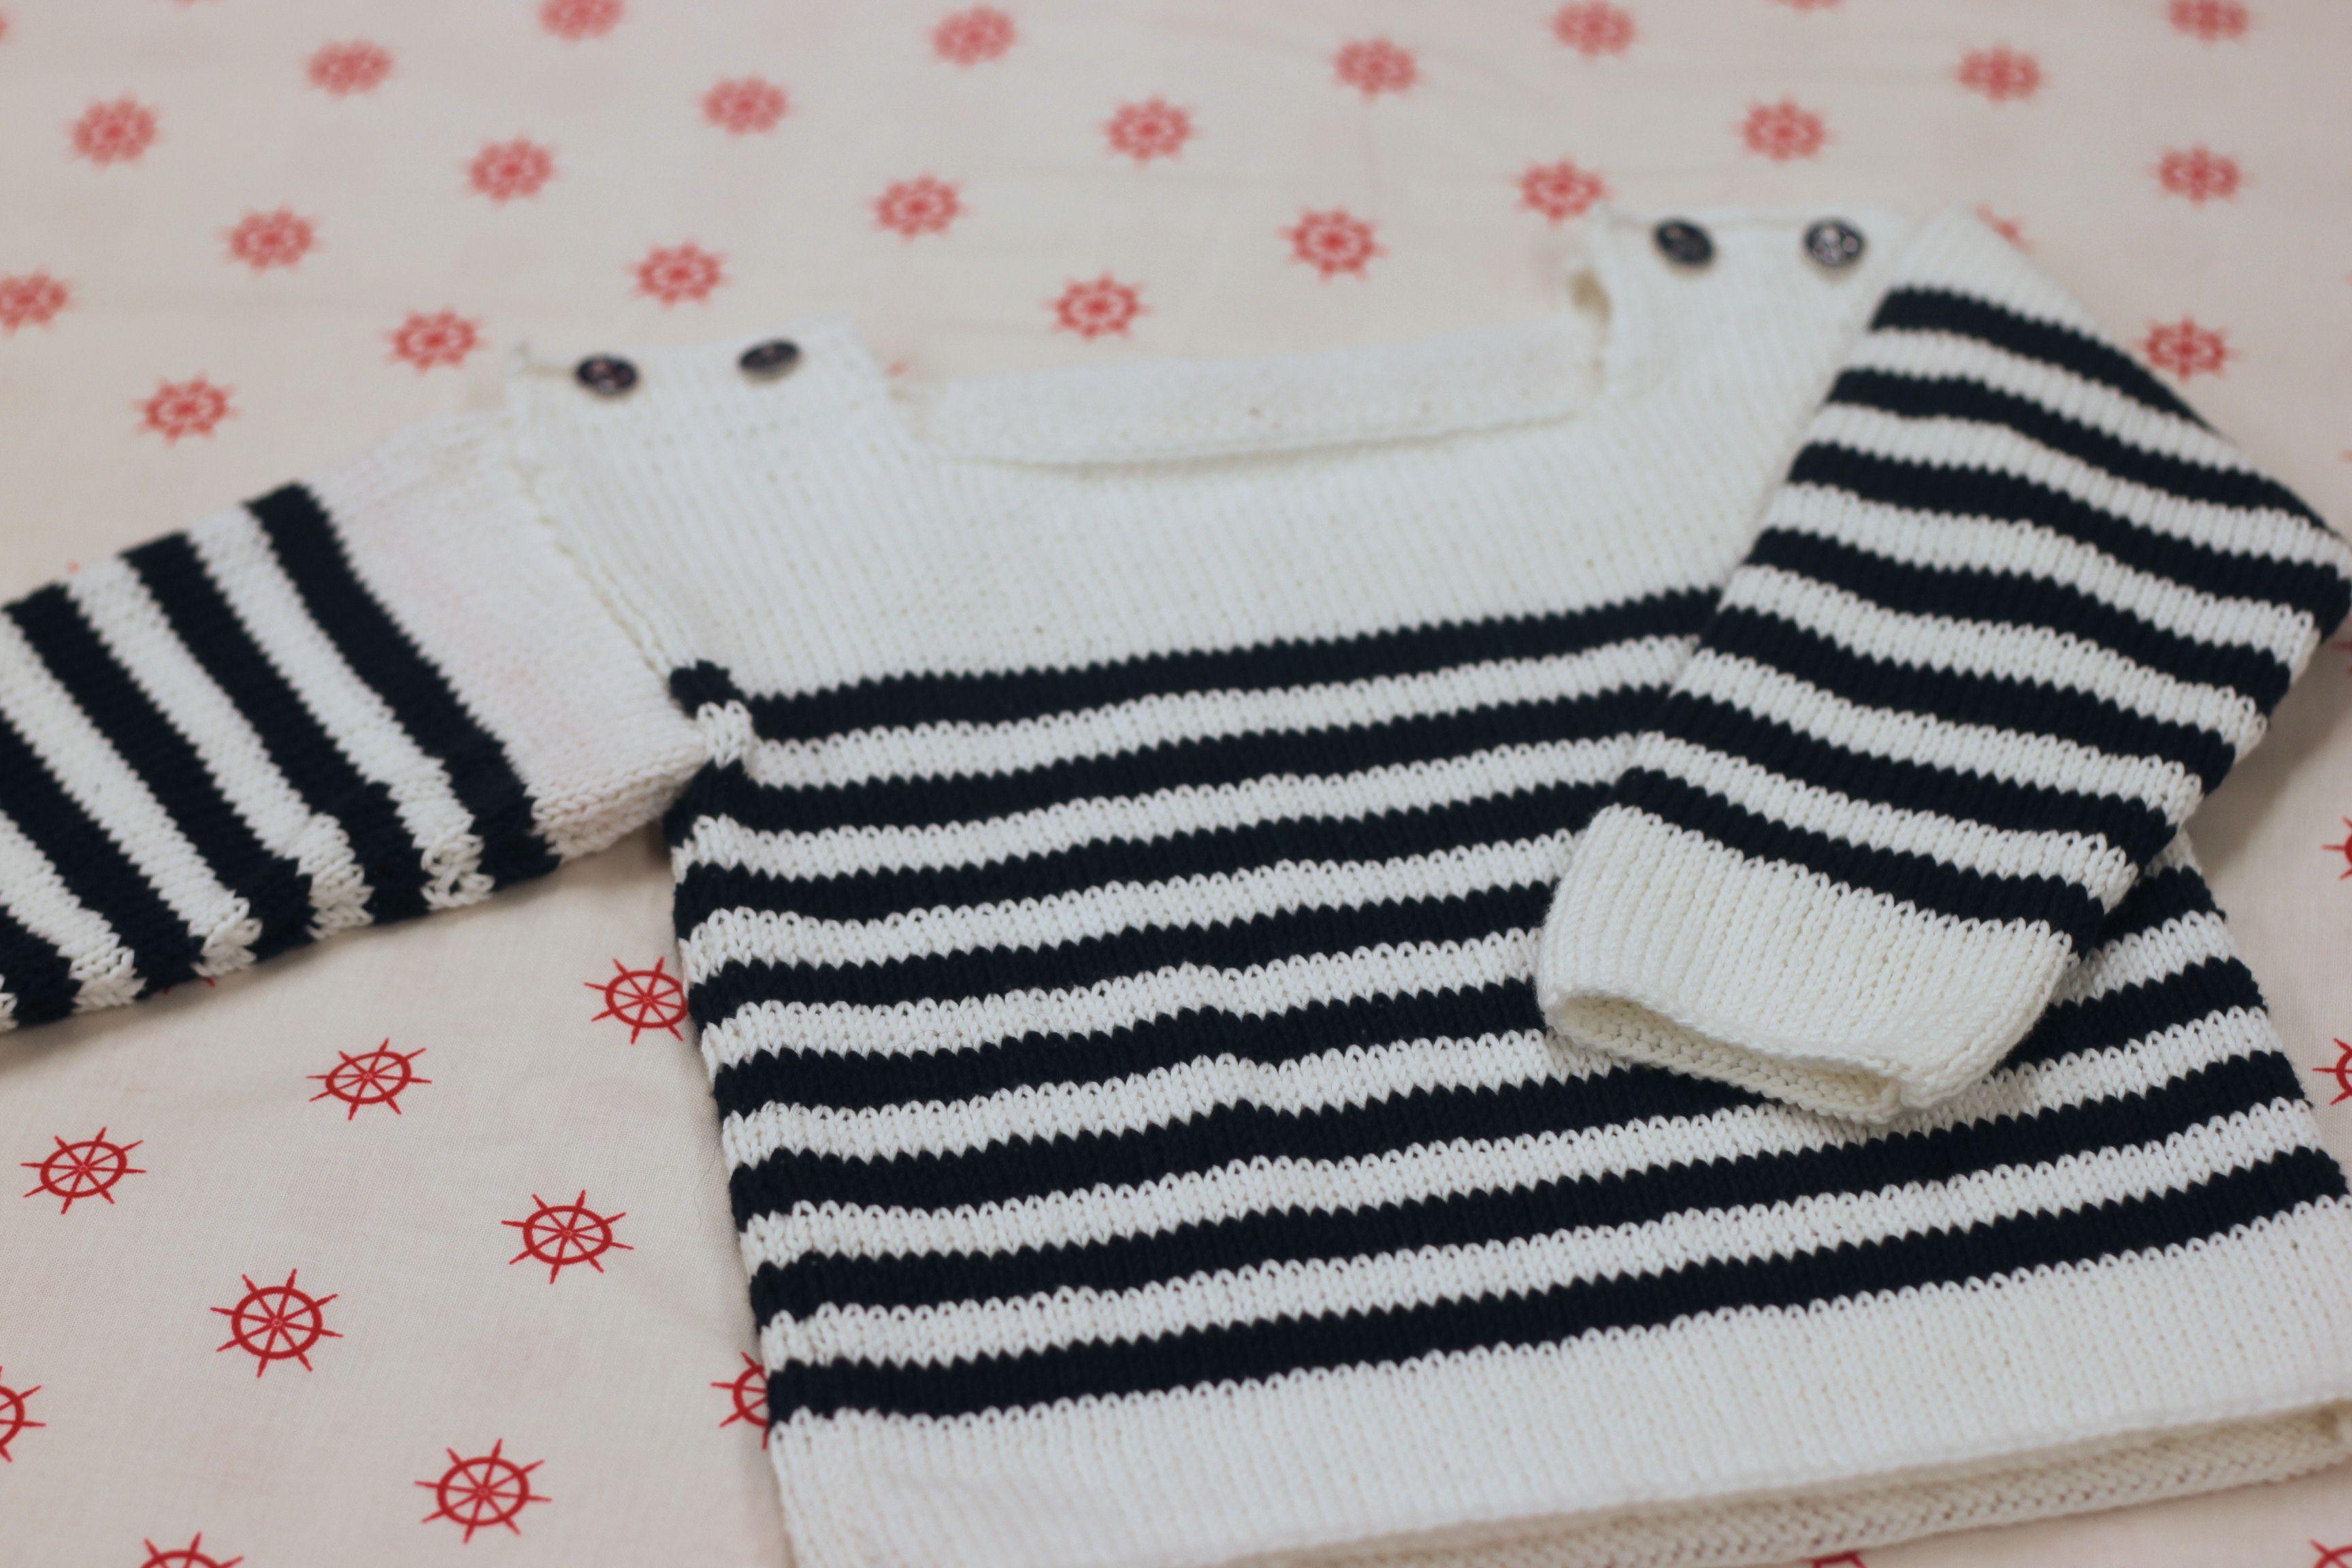 tuto tricot 6 9 mois Pull marin   bébé   Tricot, Tricot crochet et ... 35464df4ccb